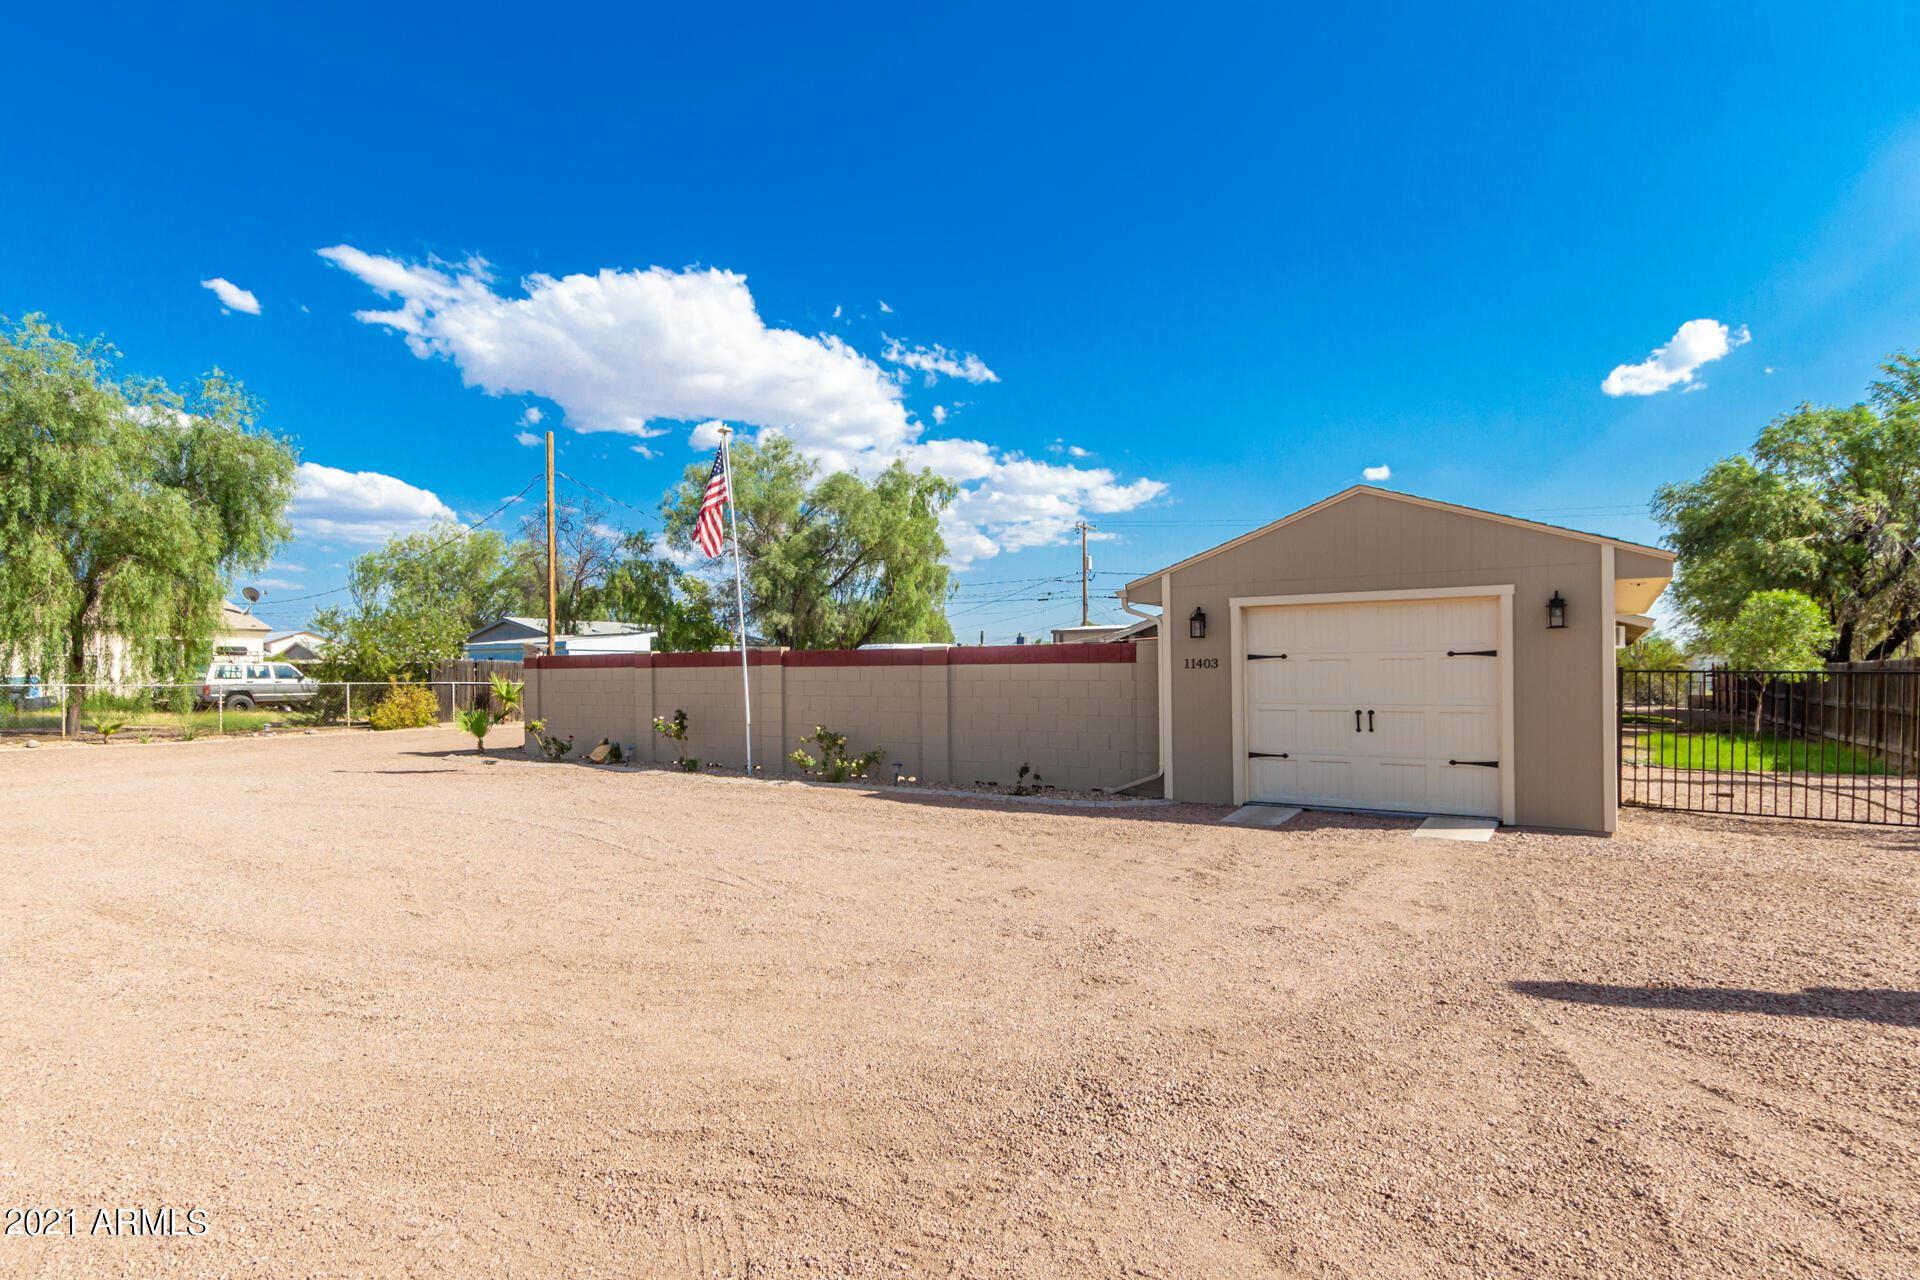 Photo of 11403 E 5TH Avenue, Apache Junction, AZ 85120 (MLS # 6290848)